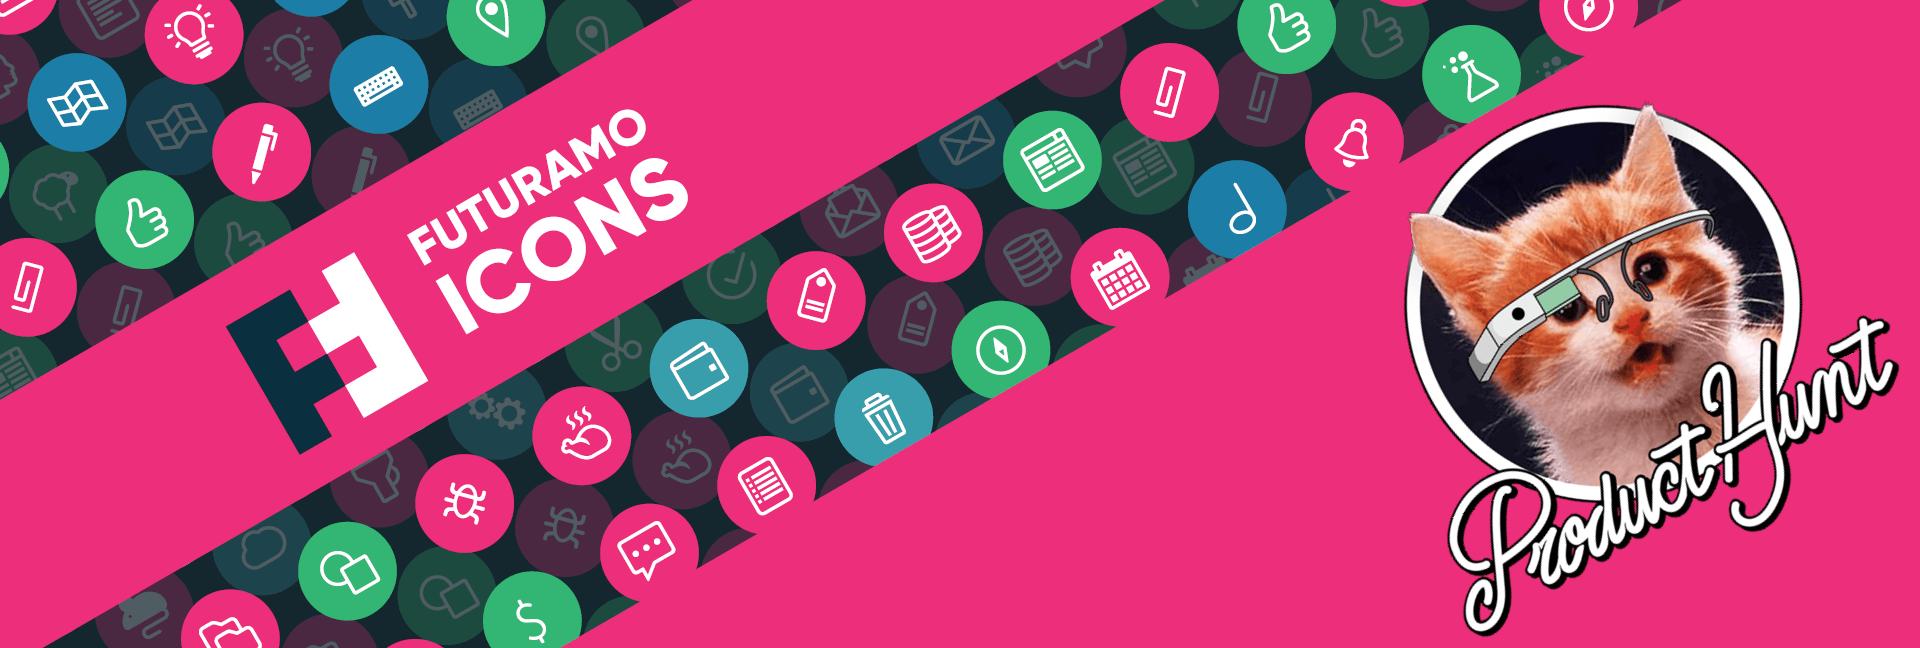 Futuramo Icons' big day on Product Hunt!